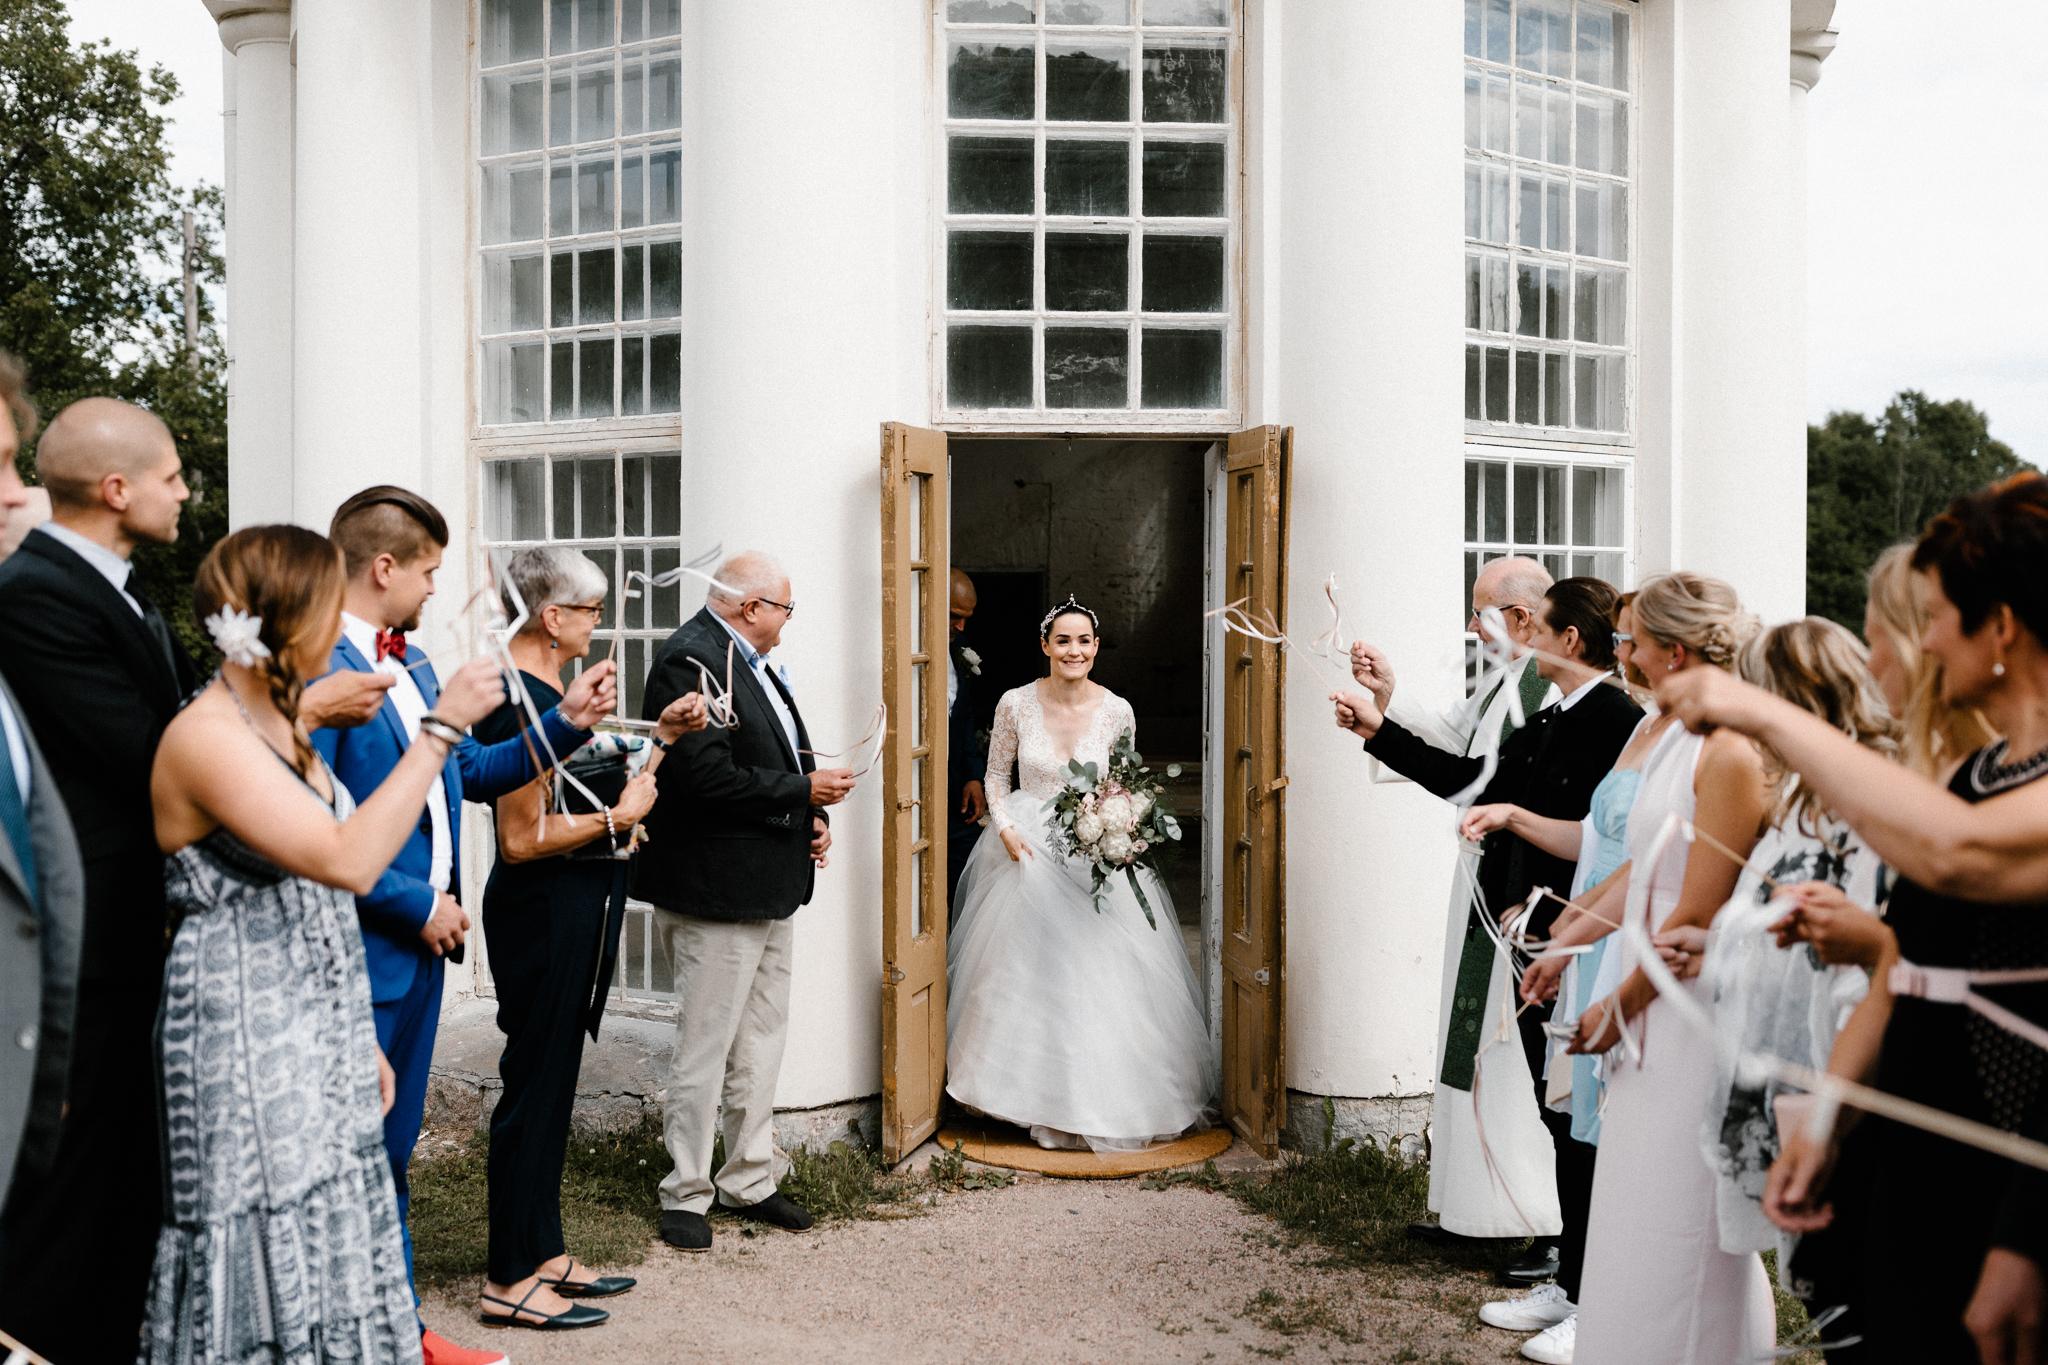 Essi + Ville   Oitbacka Gården   by Patrick Karkkolainen Wedding Photography-167.jpg